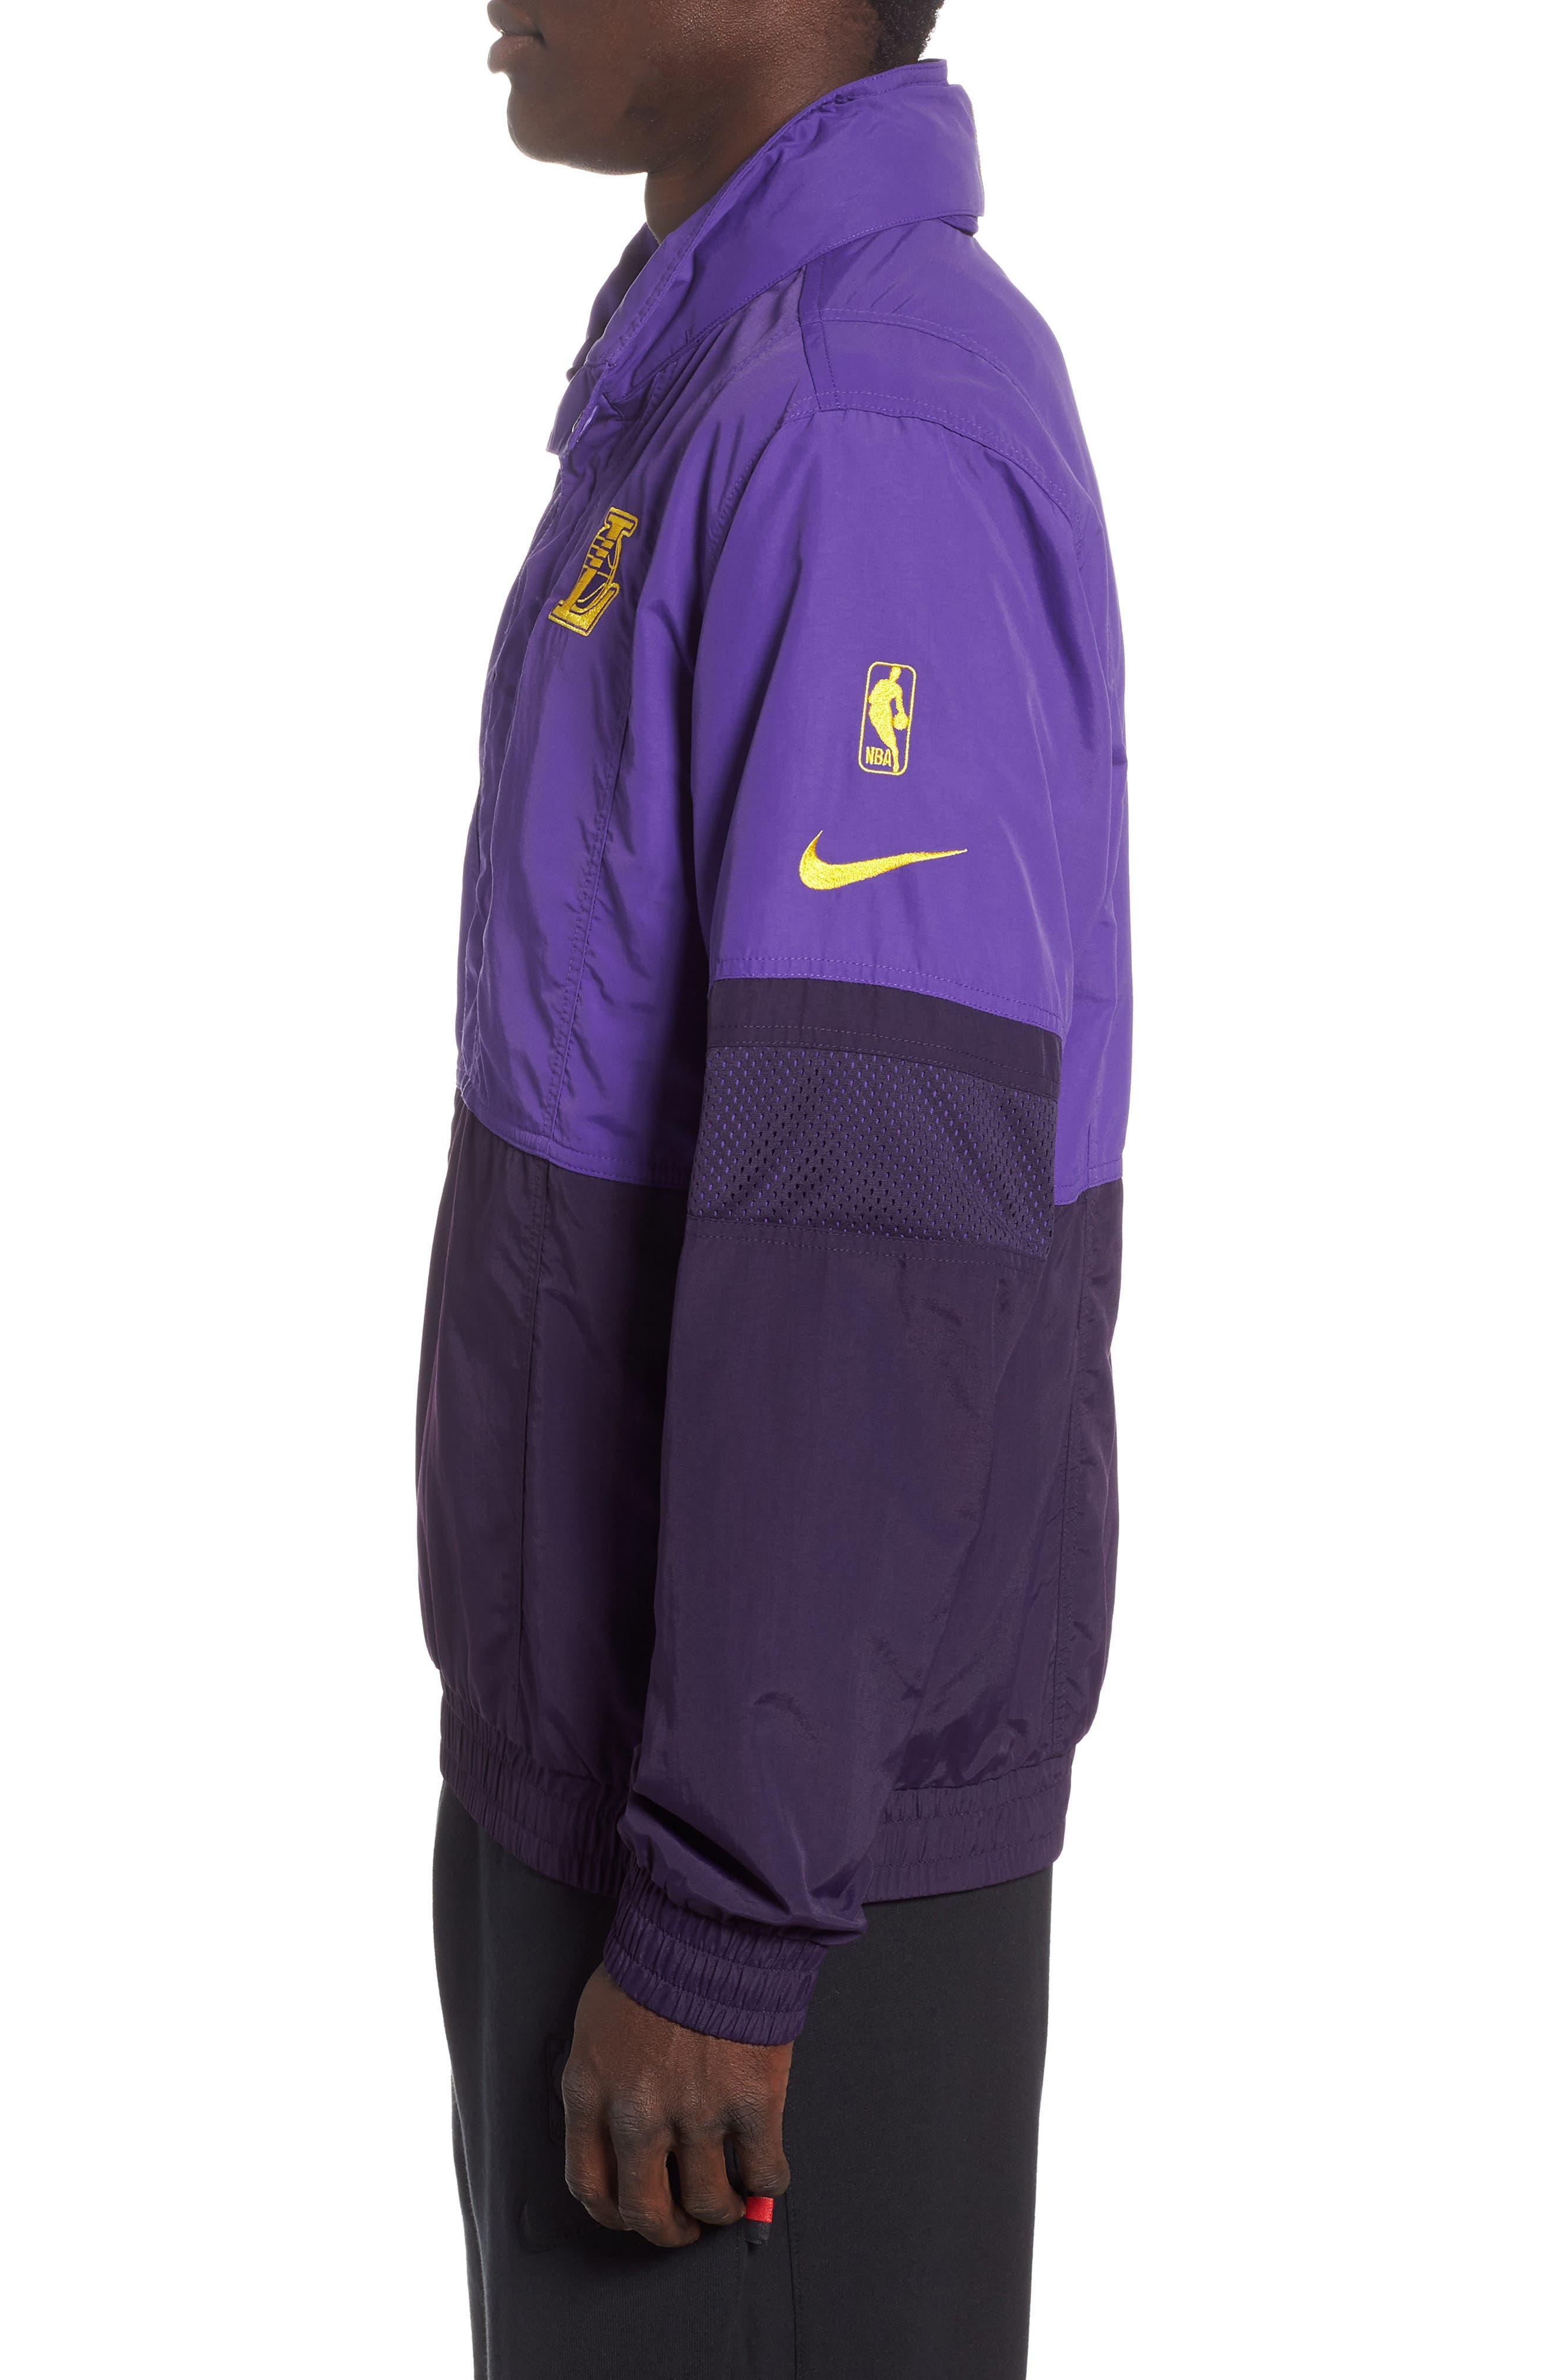 Los Angeles Lakers Courtside Warm-Up Jacket,                             Alternate thumbnail 3, color,                             FIELD PURPLE/PURPLE/ AMARILLO